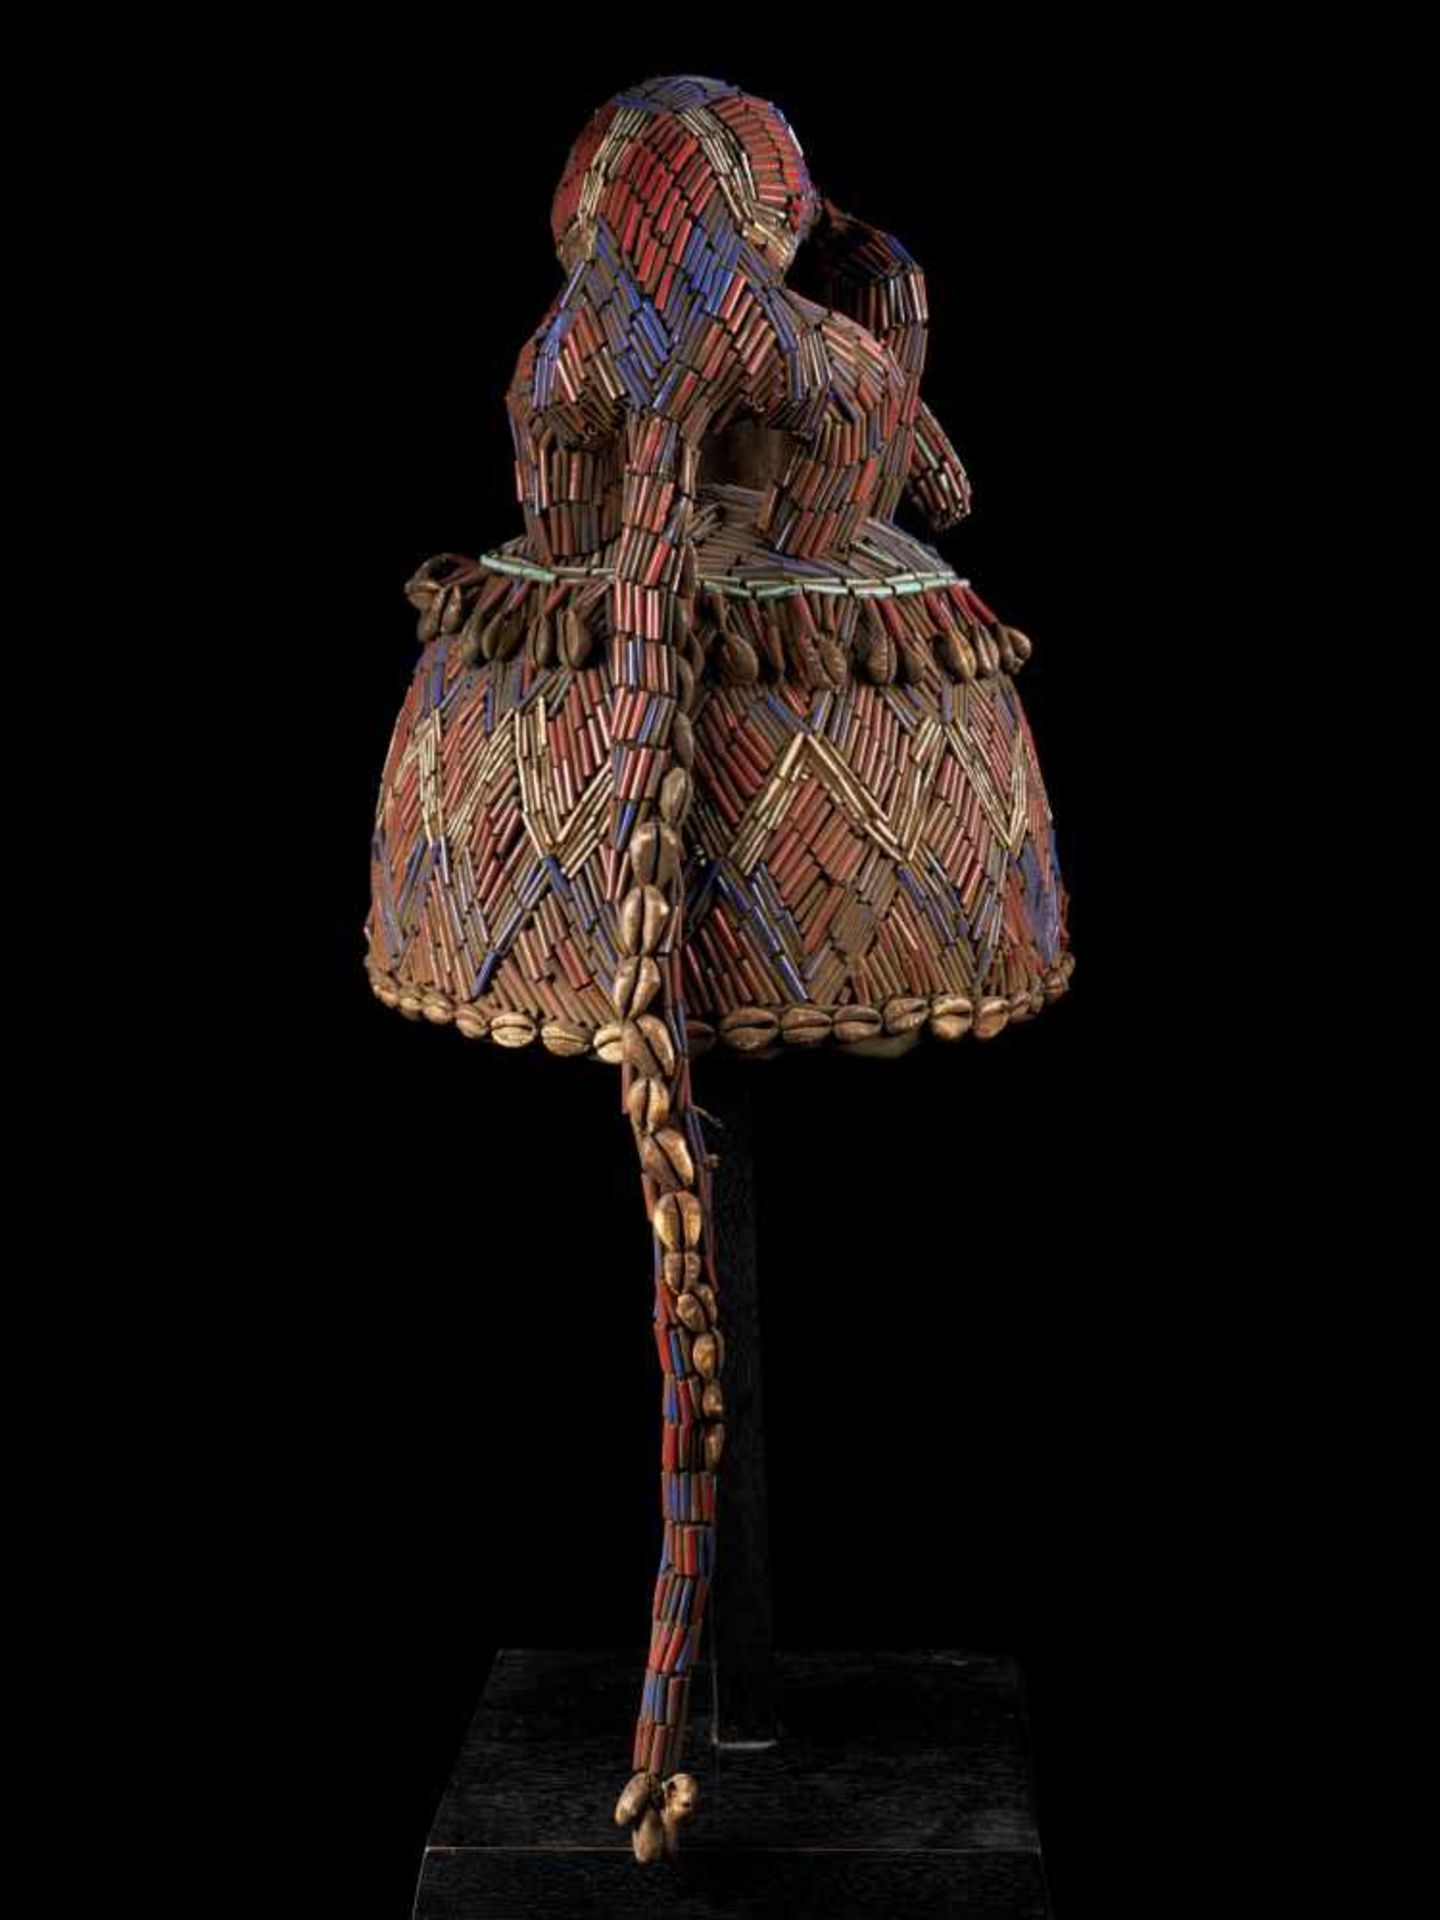 Beaded Blue Headdress With Kauris Finish - Tribal ArtThis impressive headdress is delightfully - Bild 4 aus 5